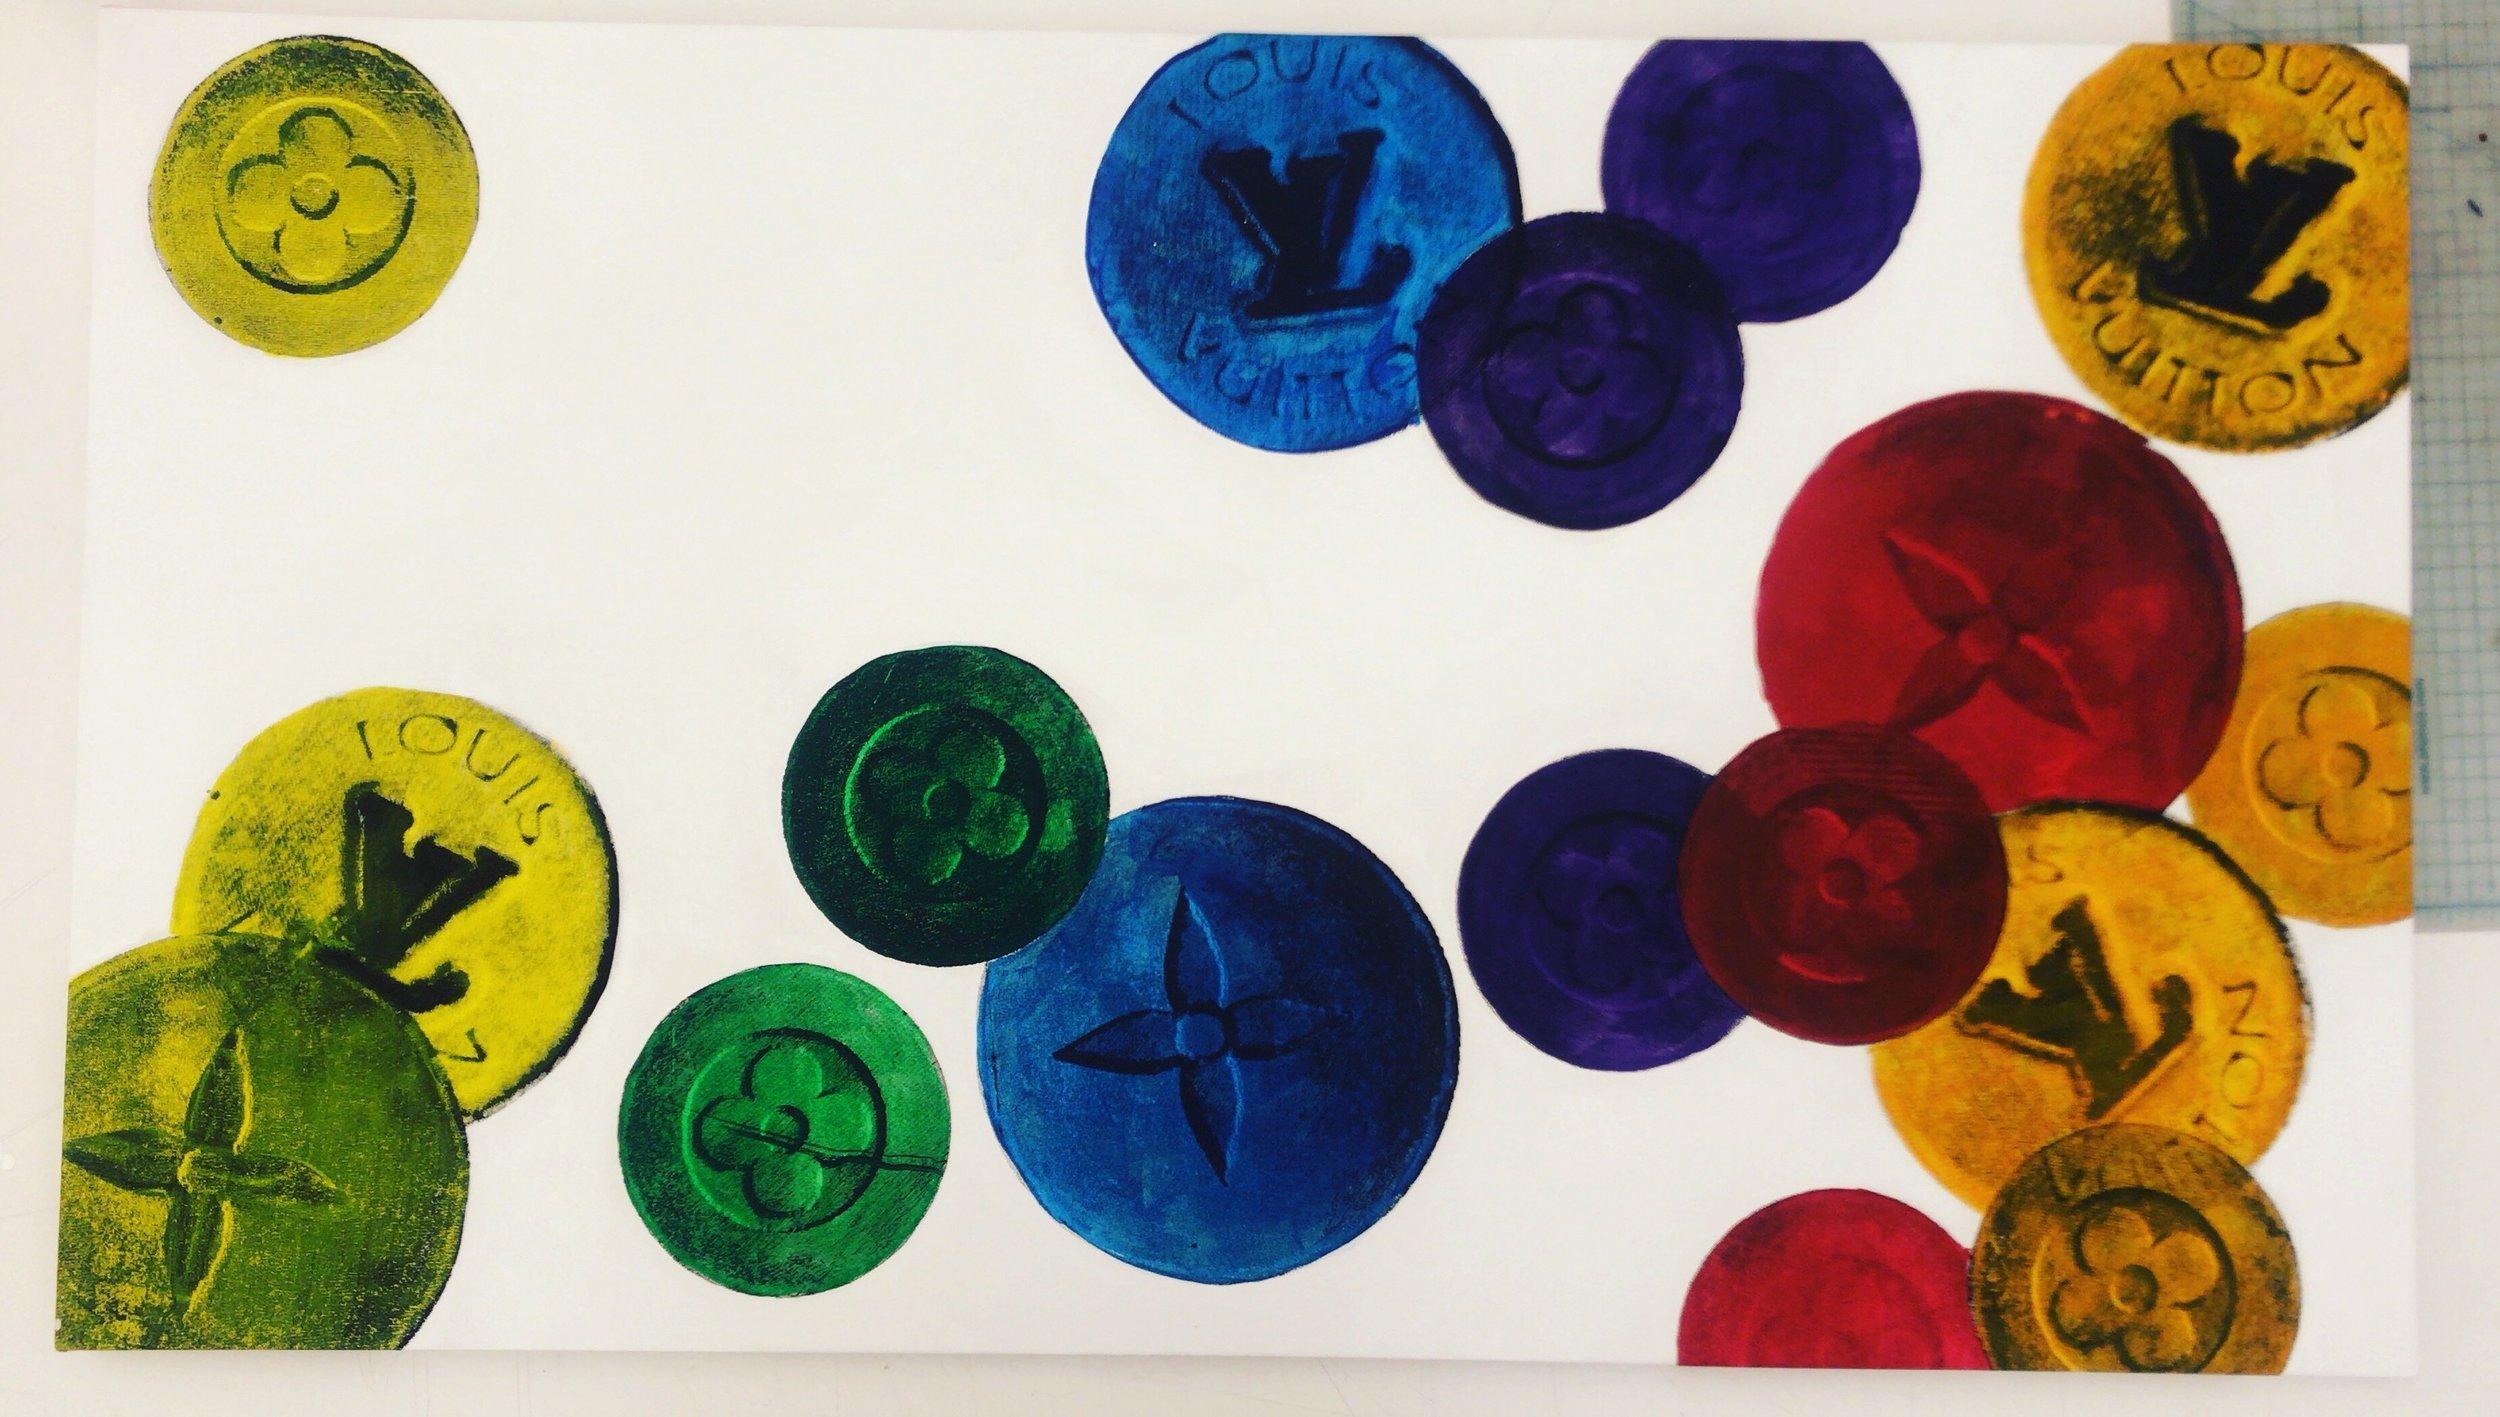 Louis Vuitton Valium - 54 x 33 | Acrylic on Canvas | July 18 |Buyer Inquiry